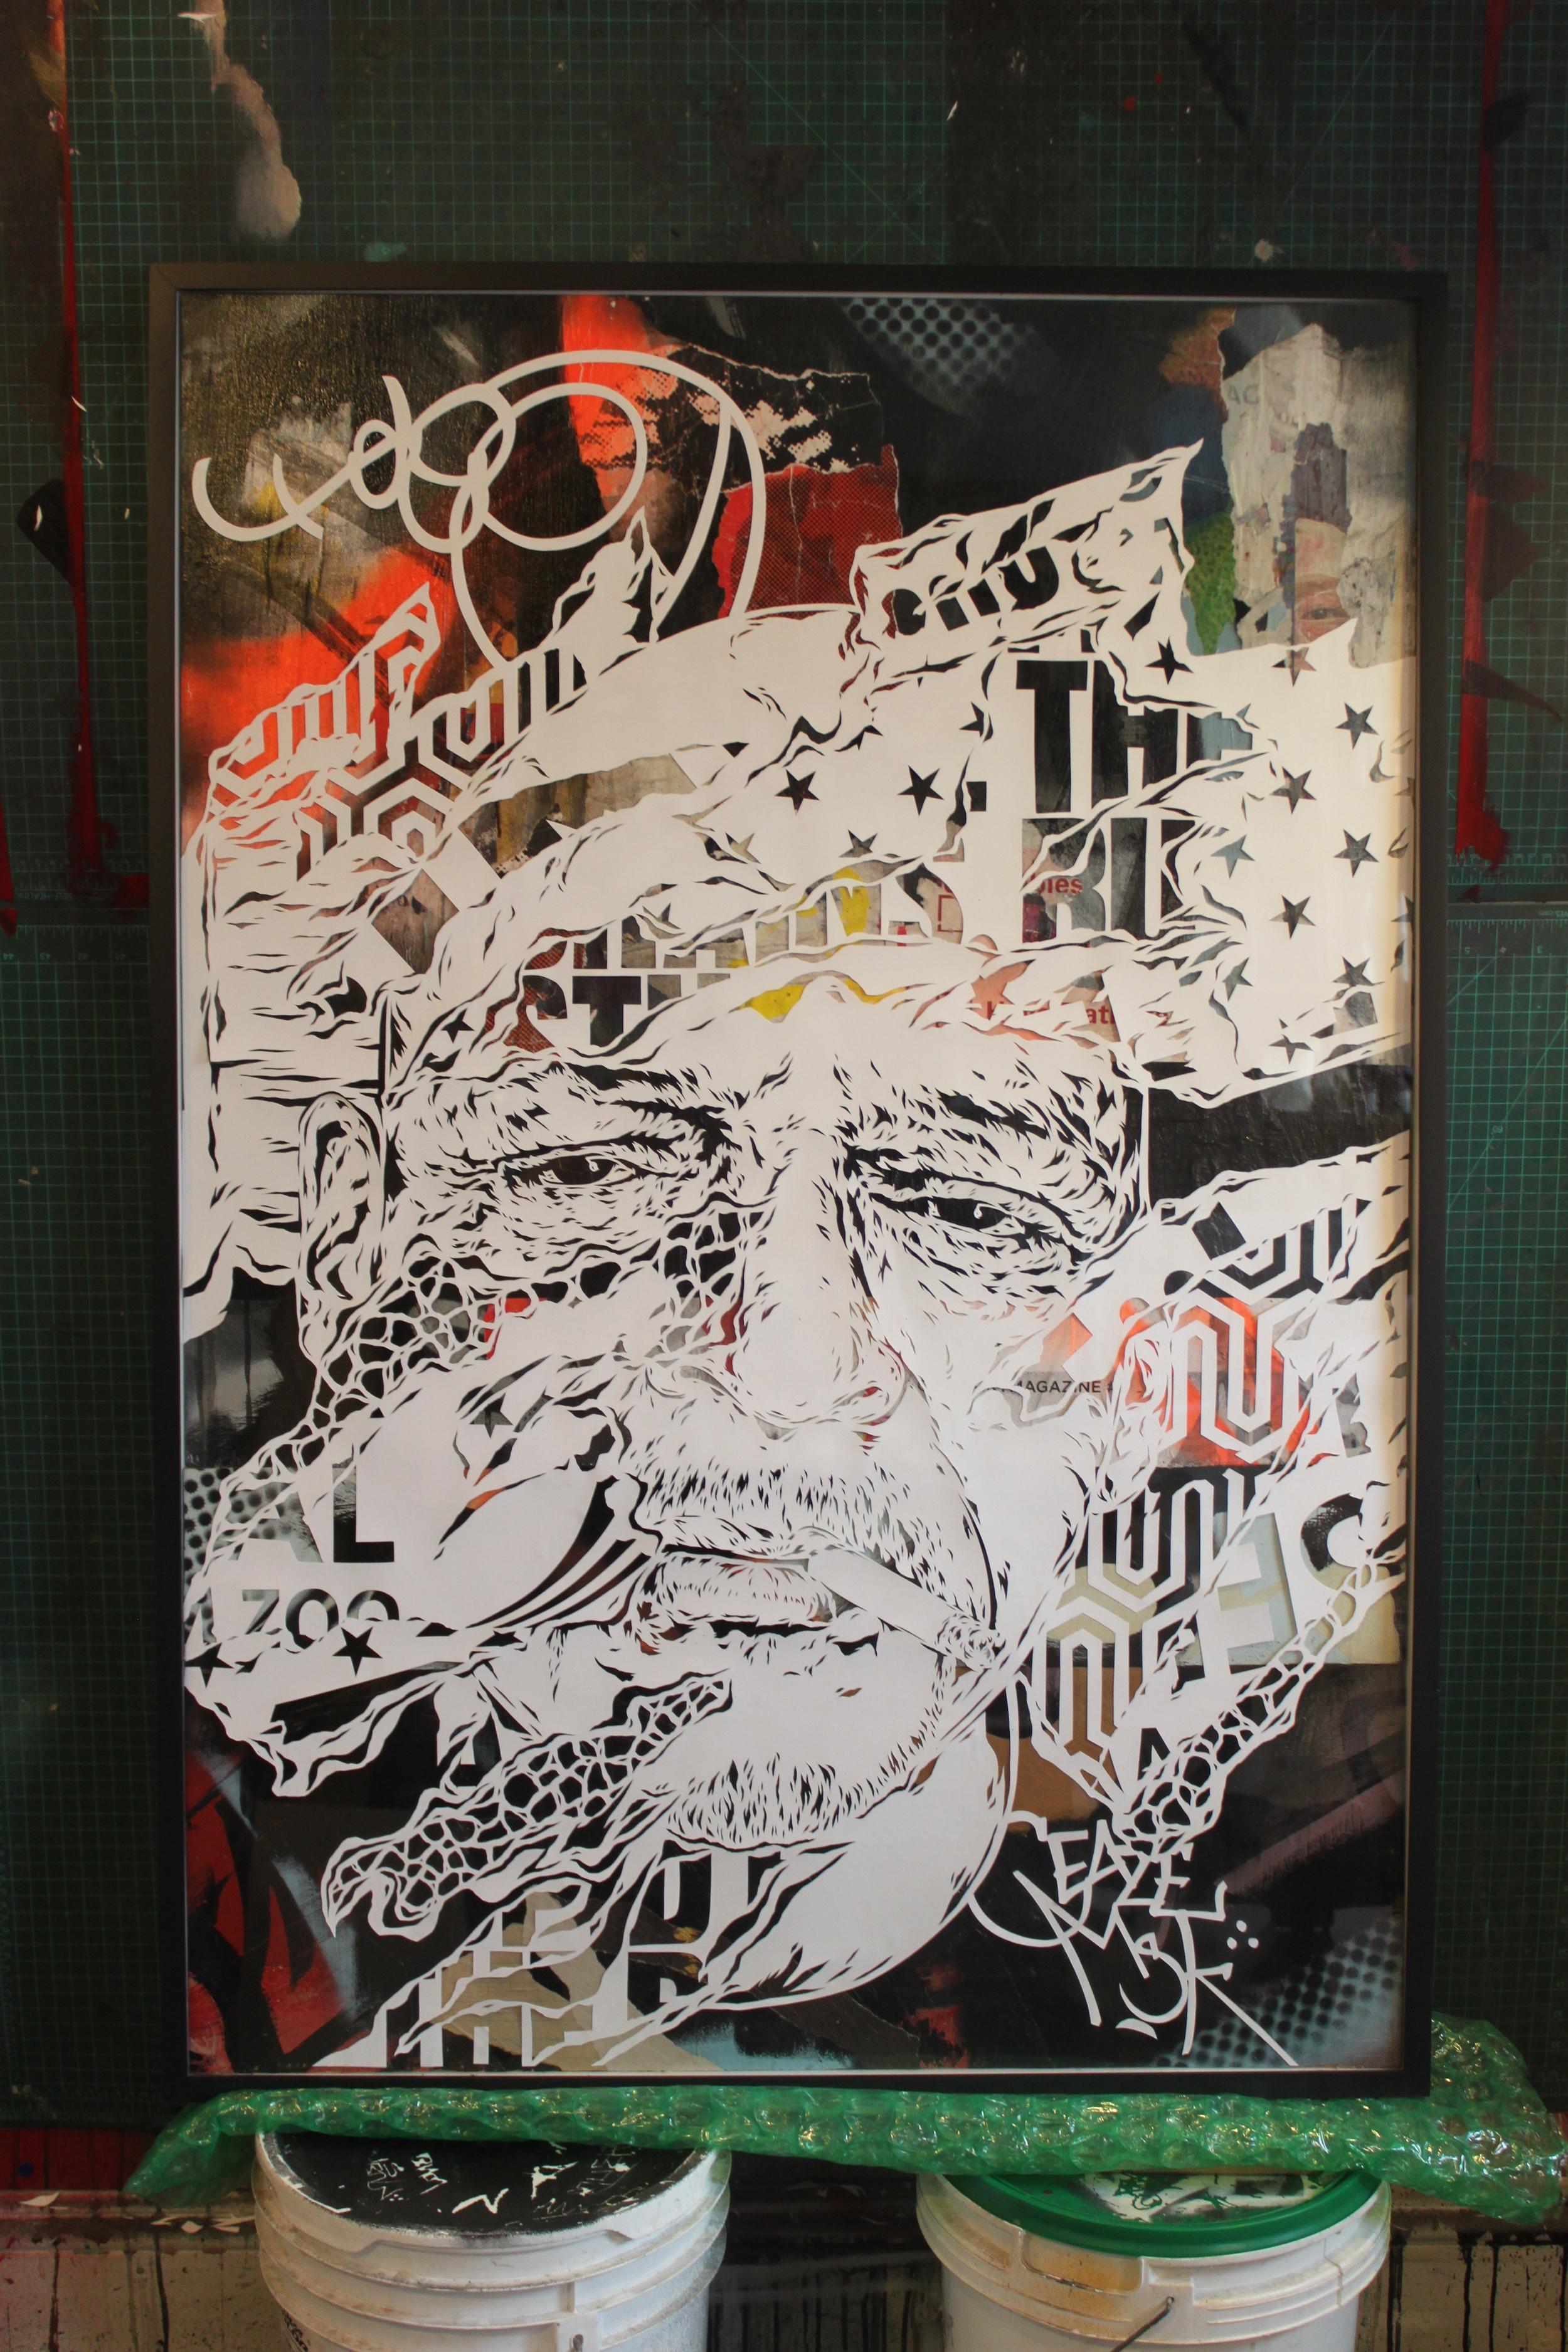 Newark Ave. Portrait of Taco AKA Tick Tock. Ian Kuali'i